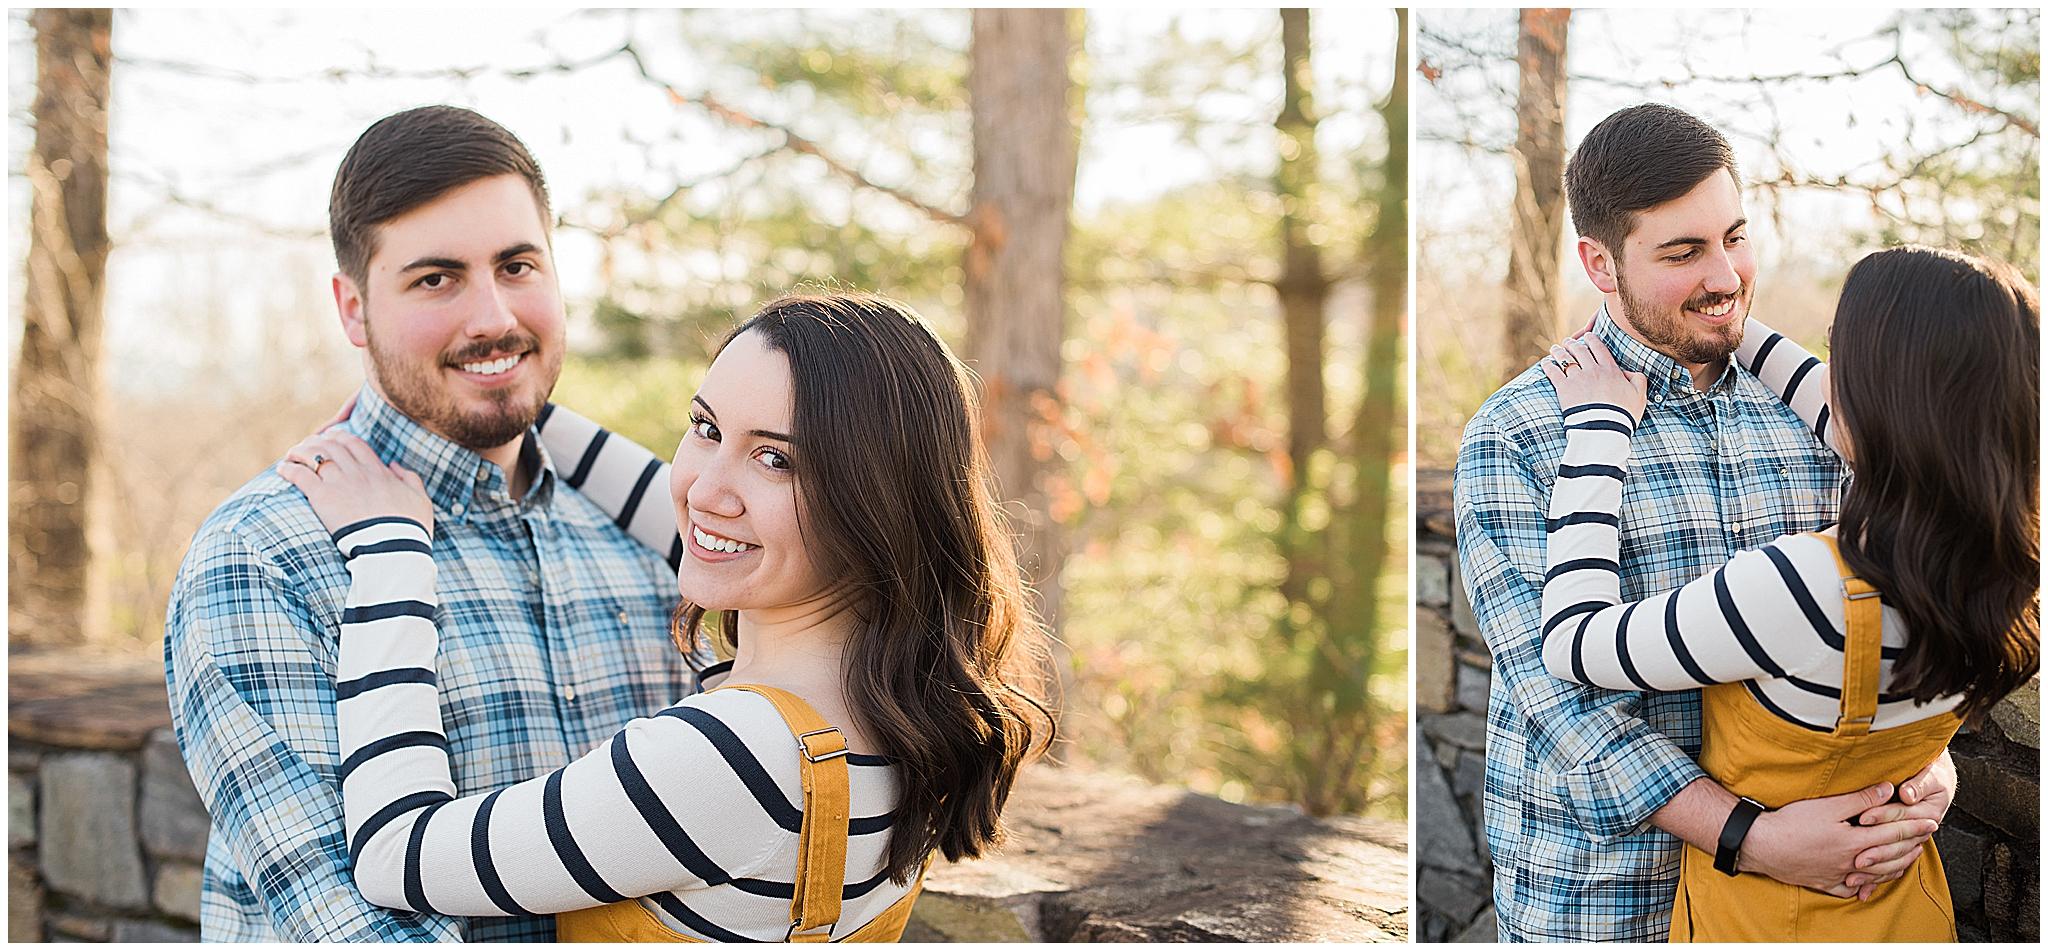 Wedding_Photographer_Asheville_engagement_Arboretum_0006.jpg